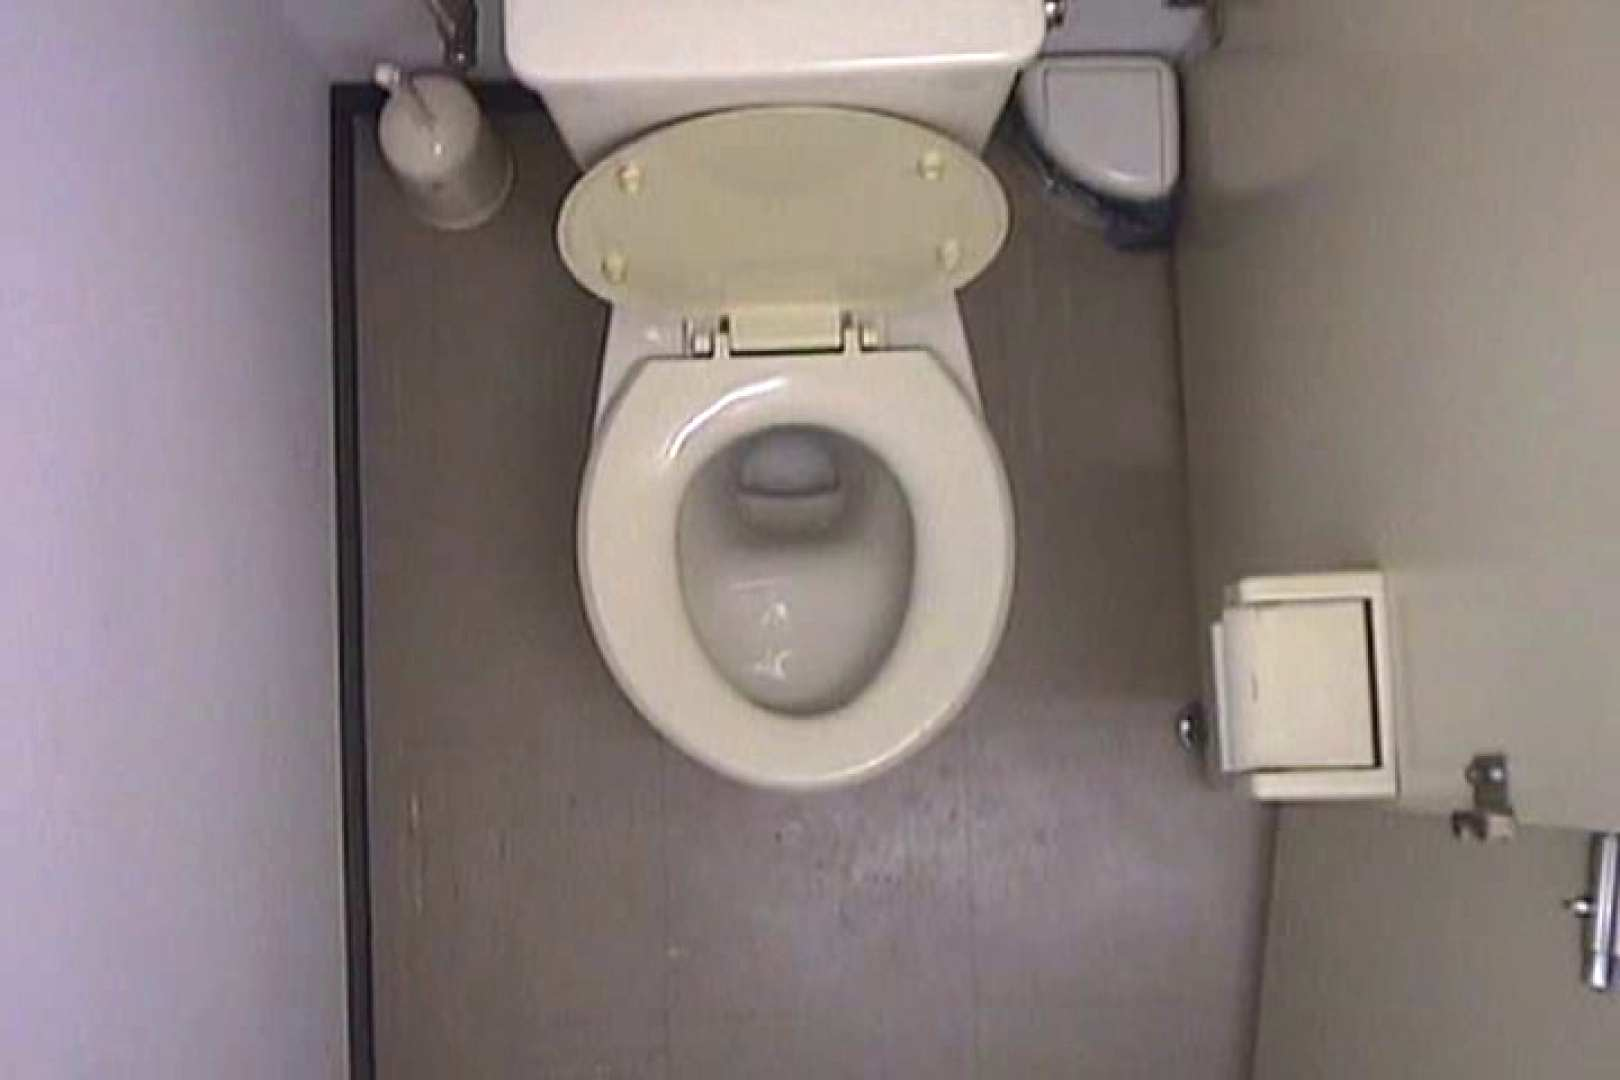 雑居ビル洗面所オナニーVol.2 洗面所 | 乳首  55PICs 46